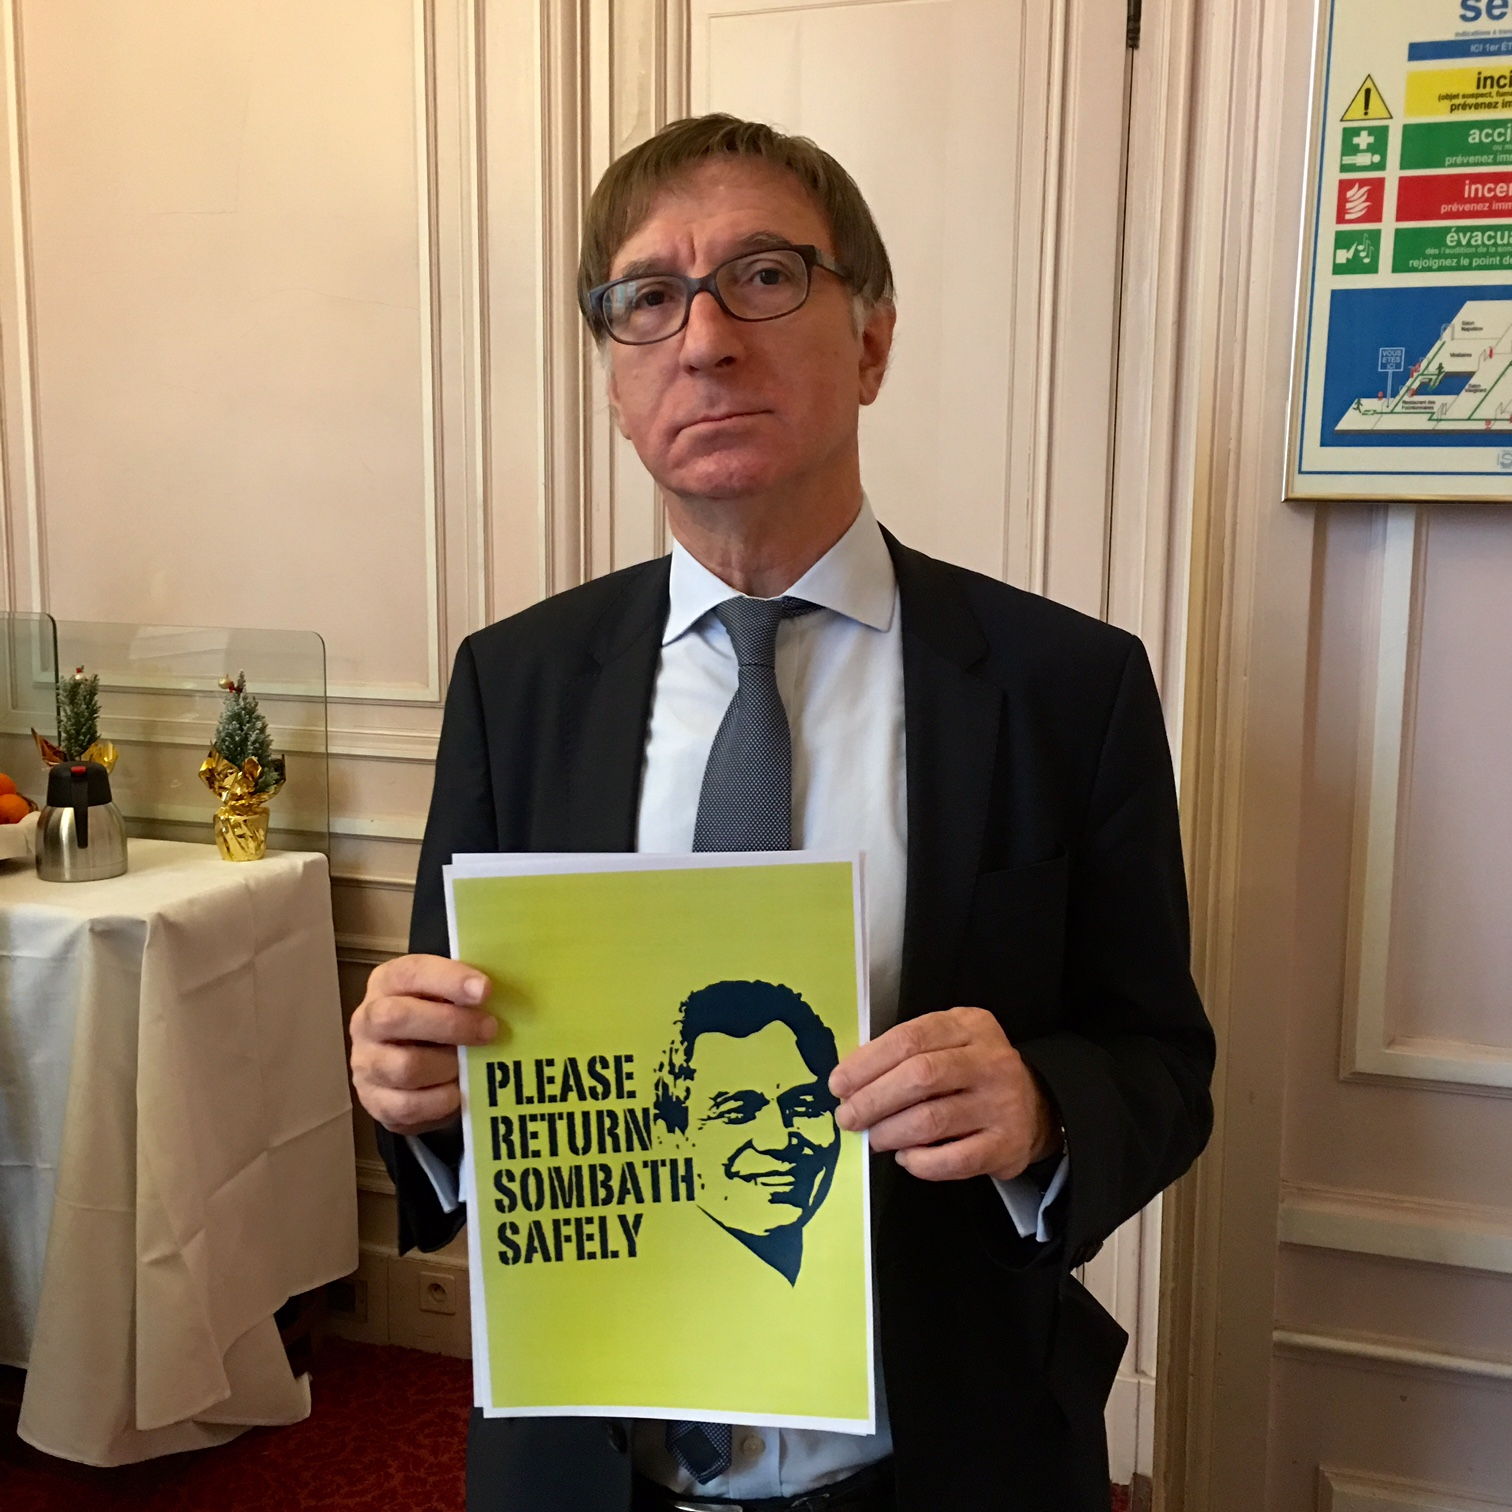 Loire Senator Bernard Fournier